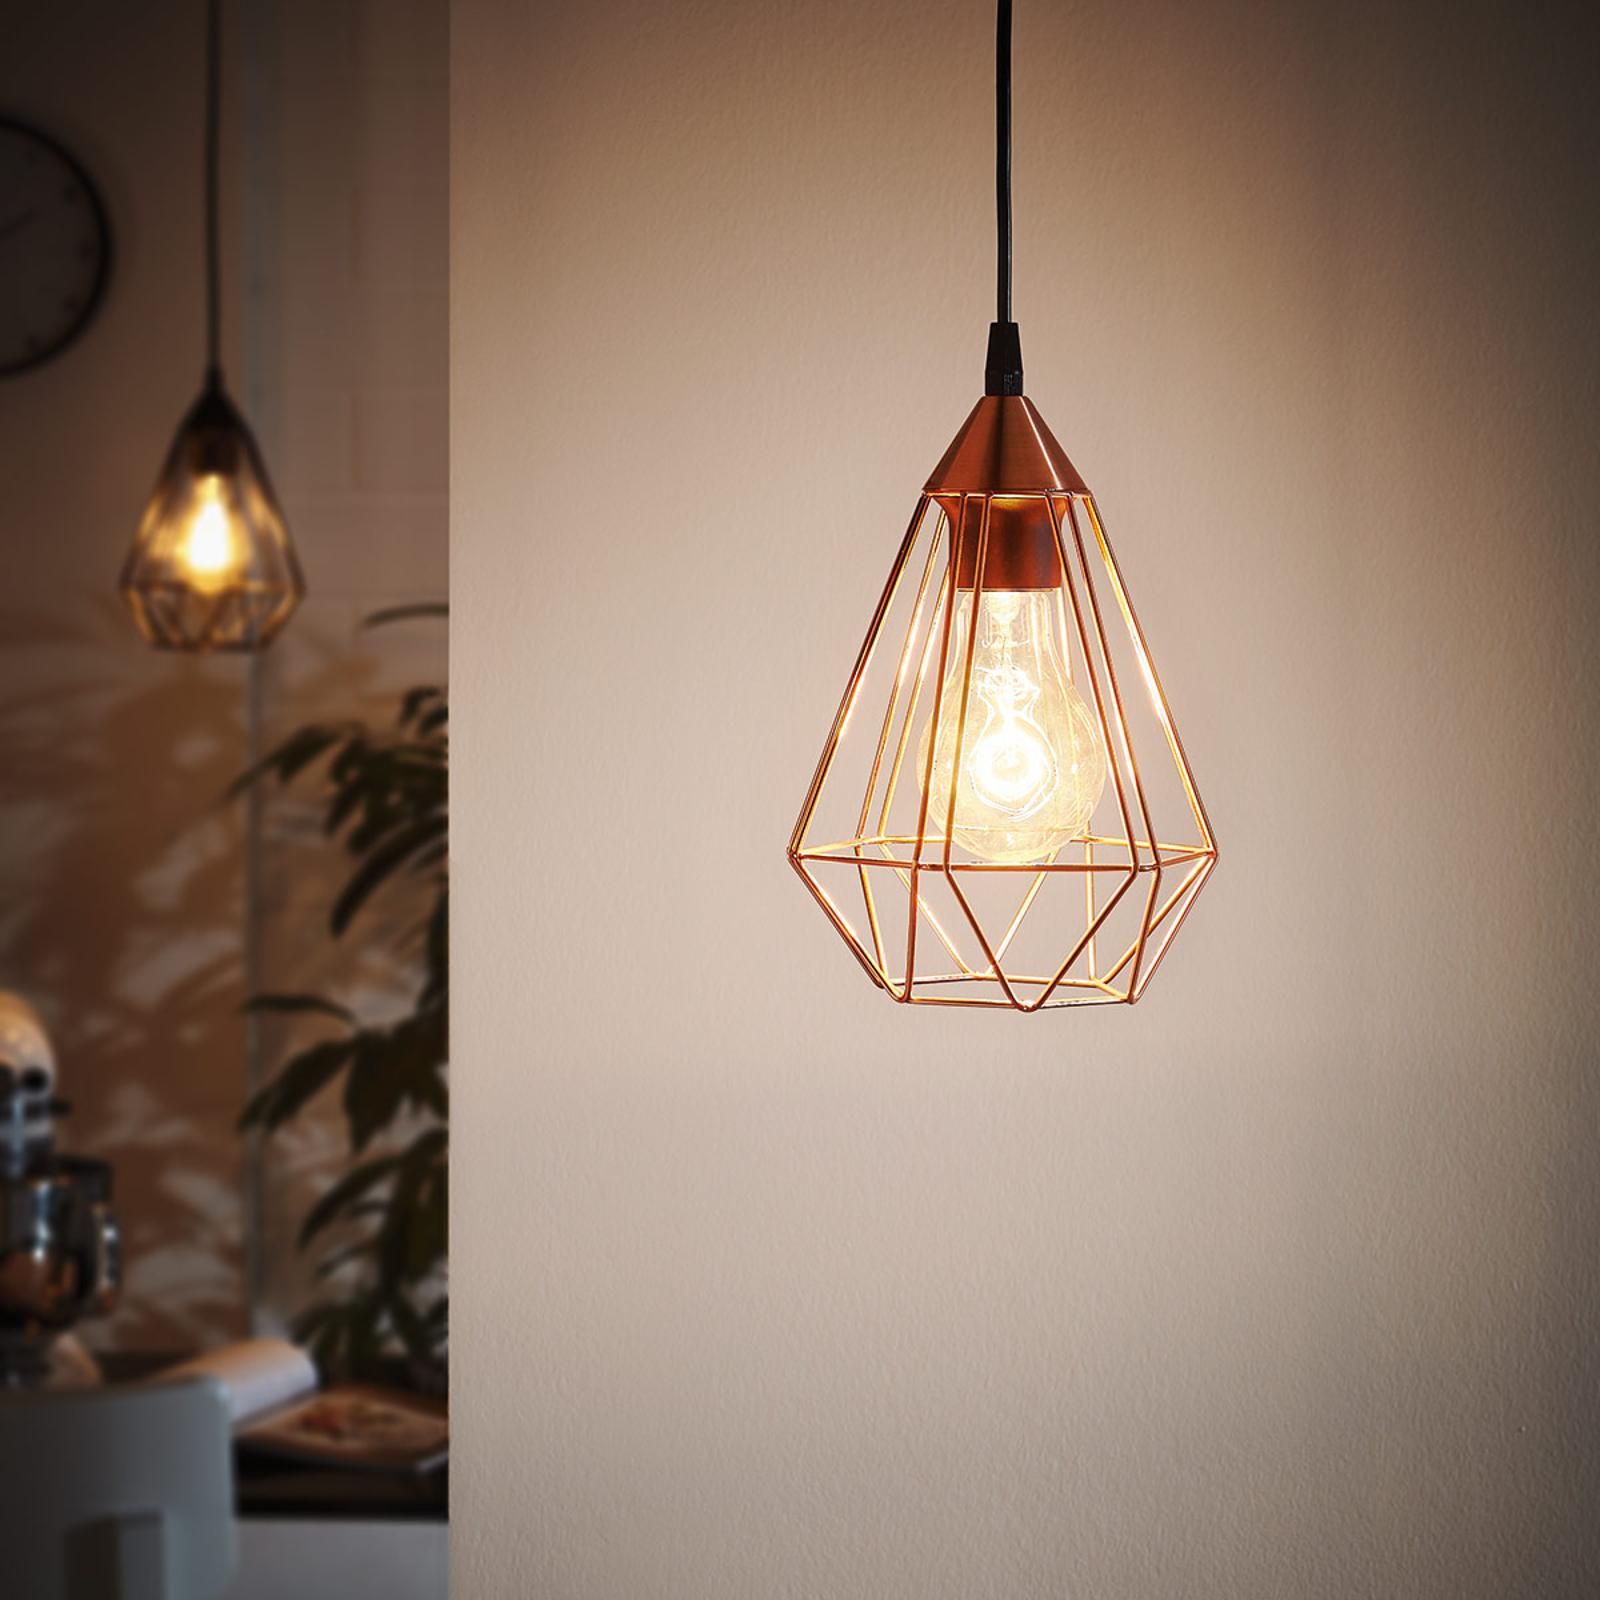 Suspension Tarbes à 1 lampe, 17,5cm, cuivre